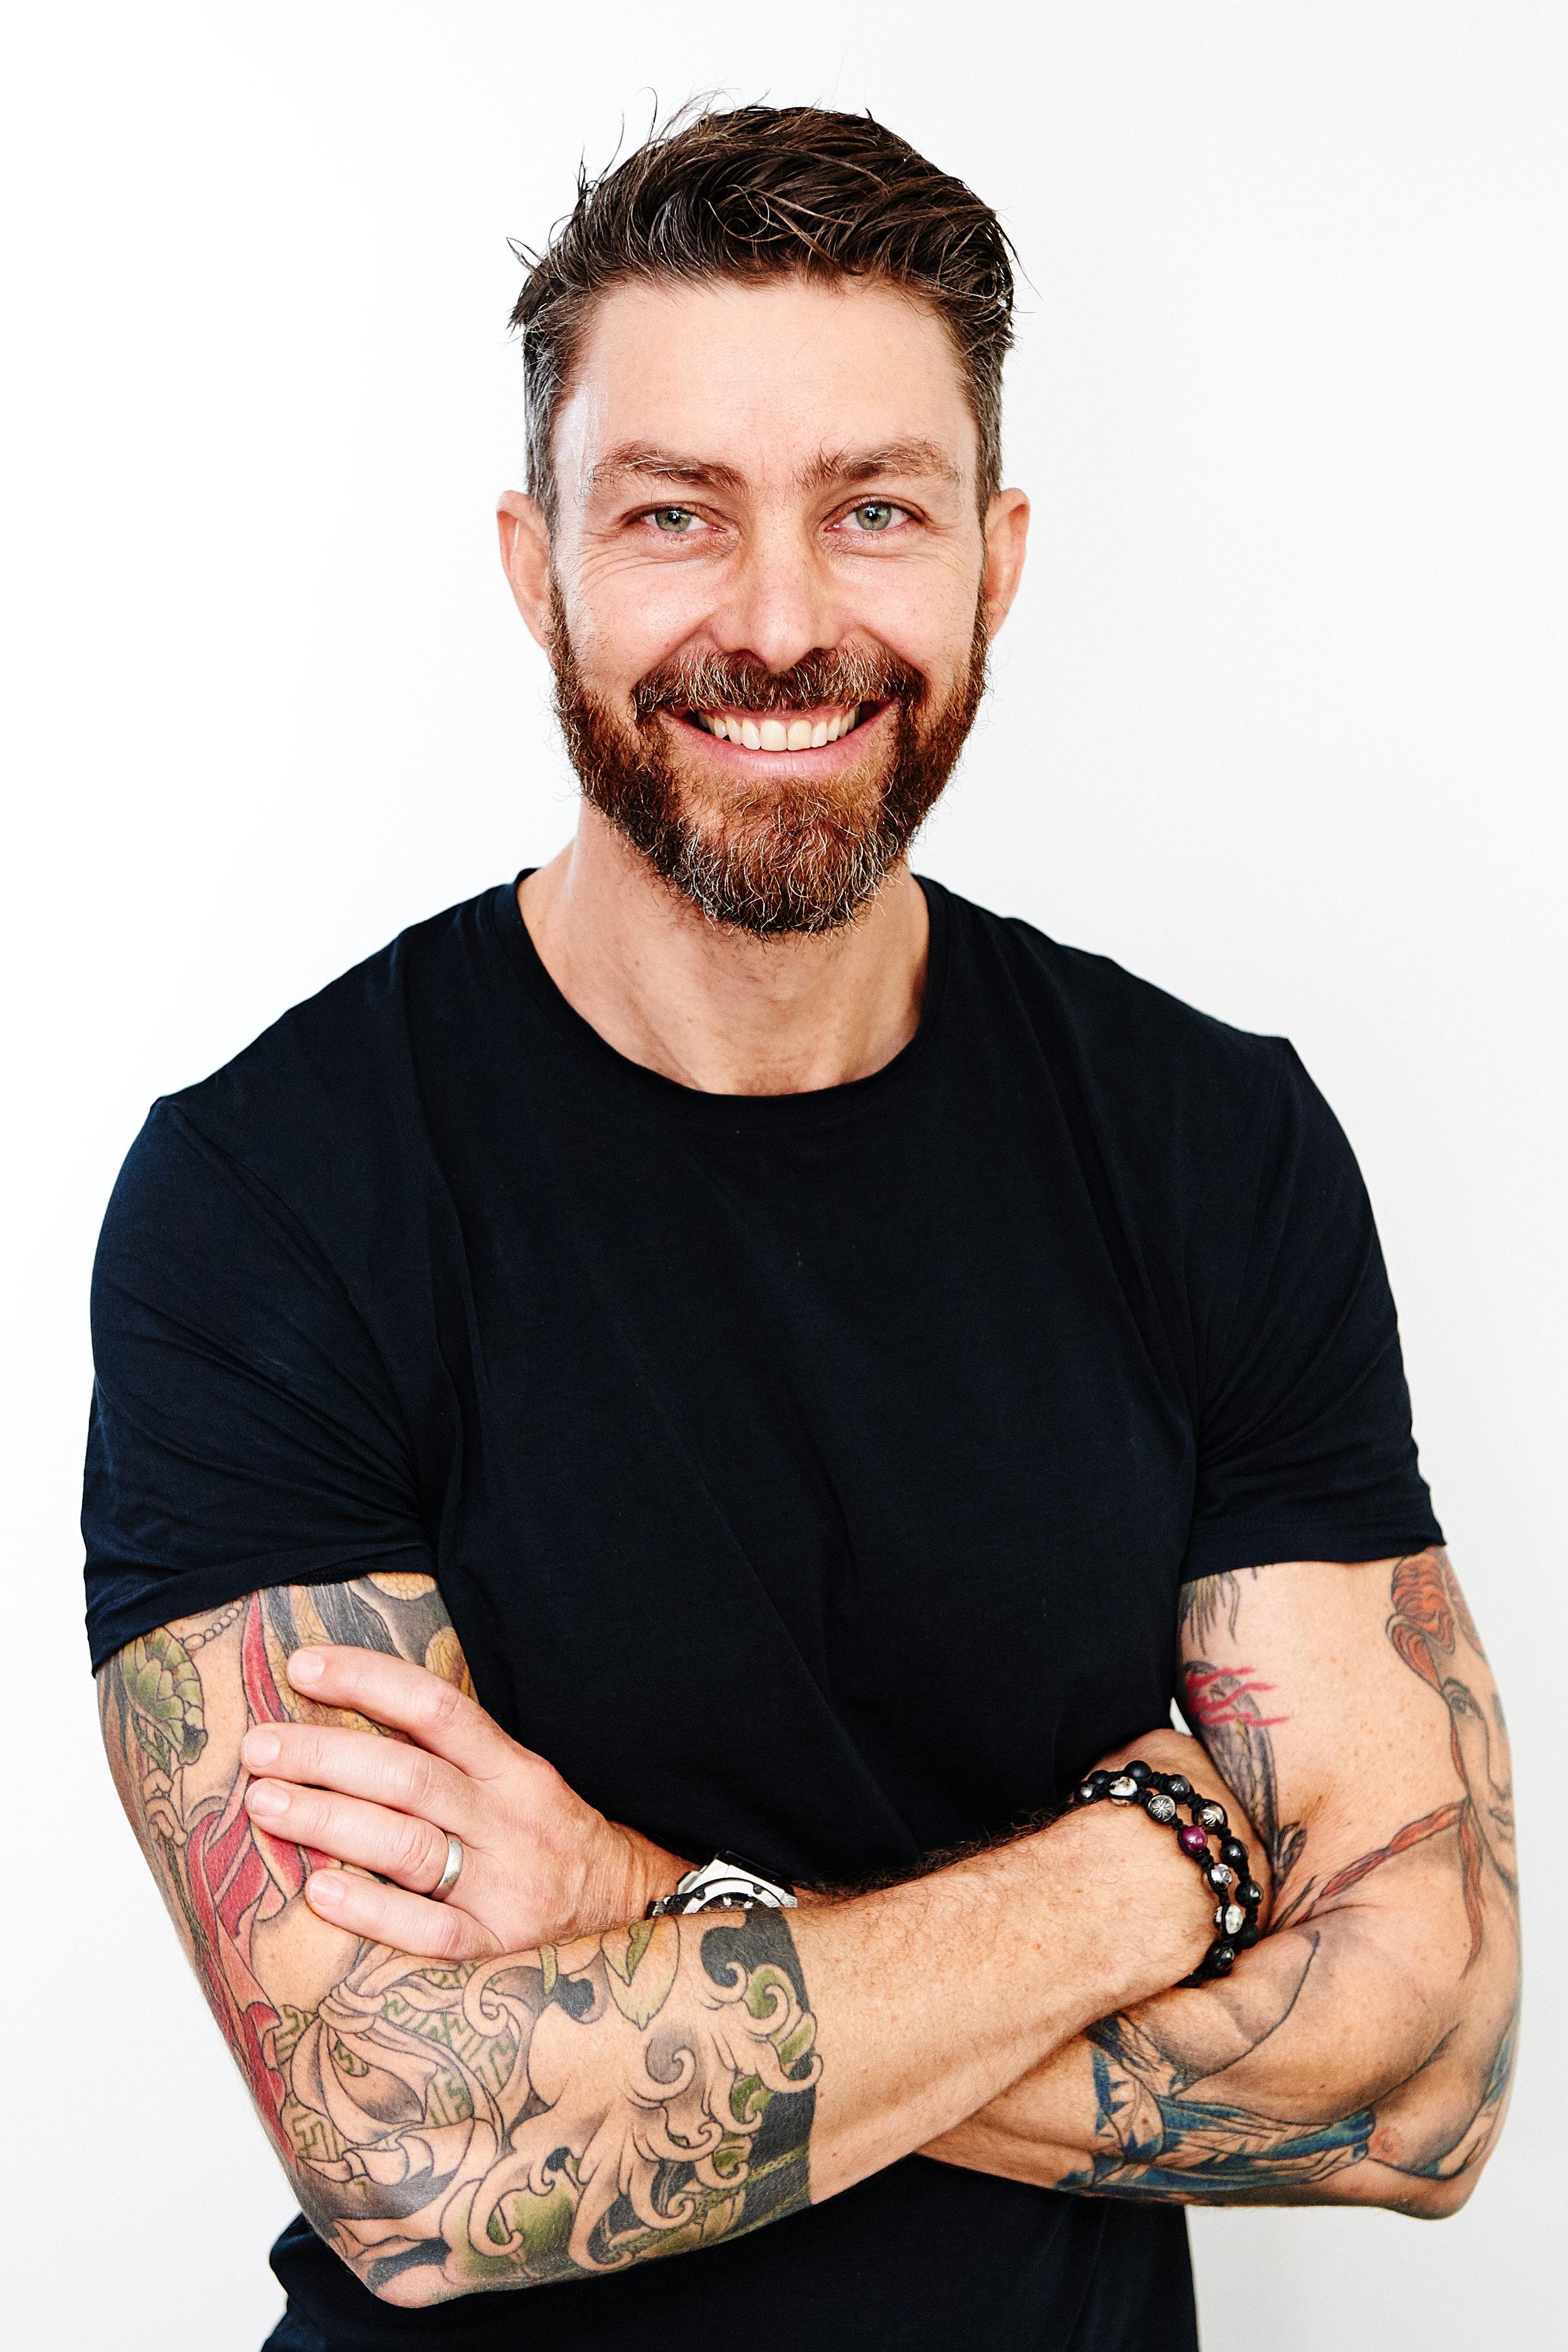 Soren Trampedach - Founder and CEO, Workclub